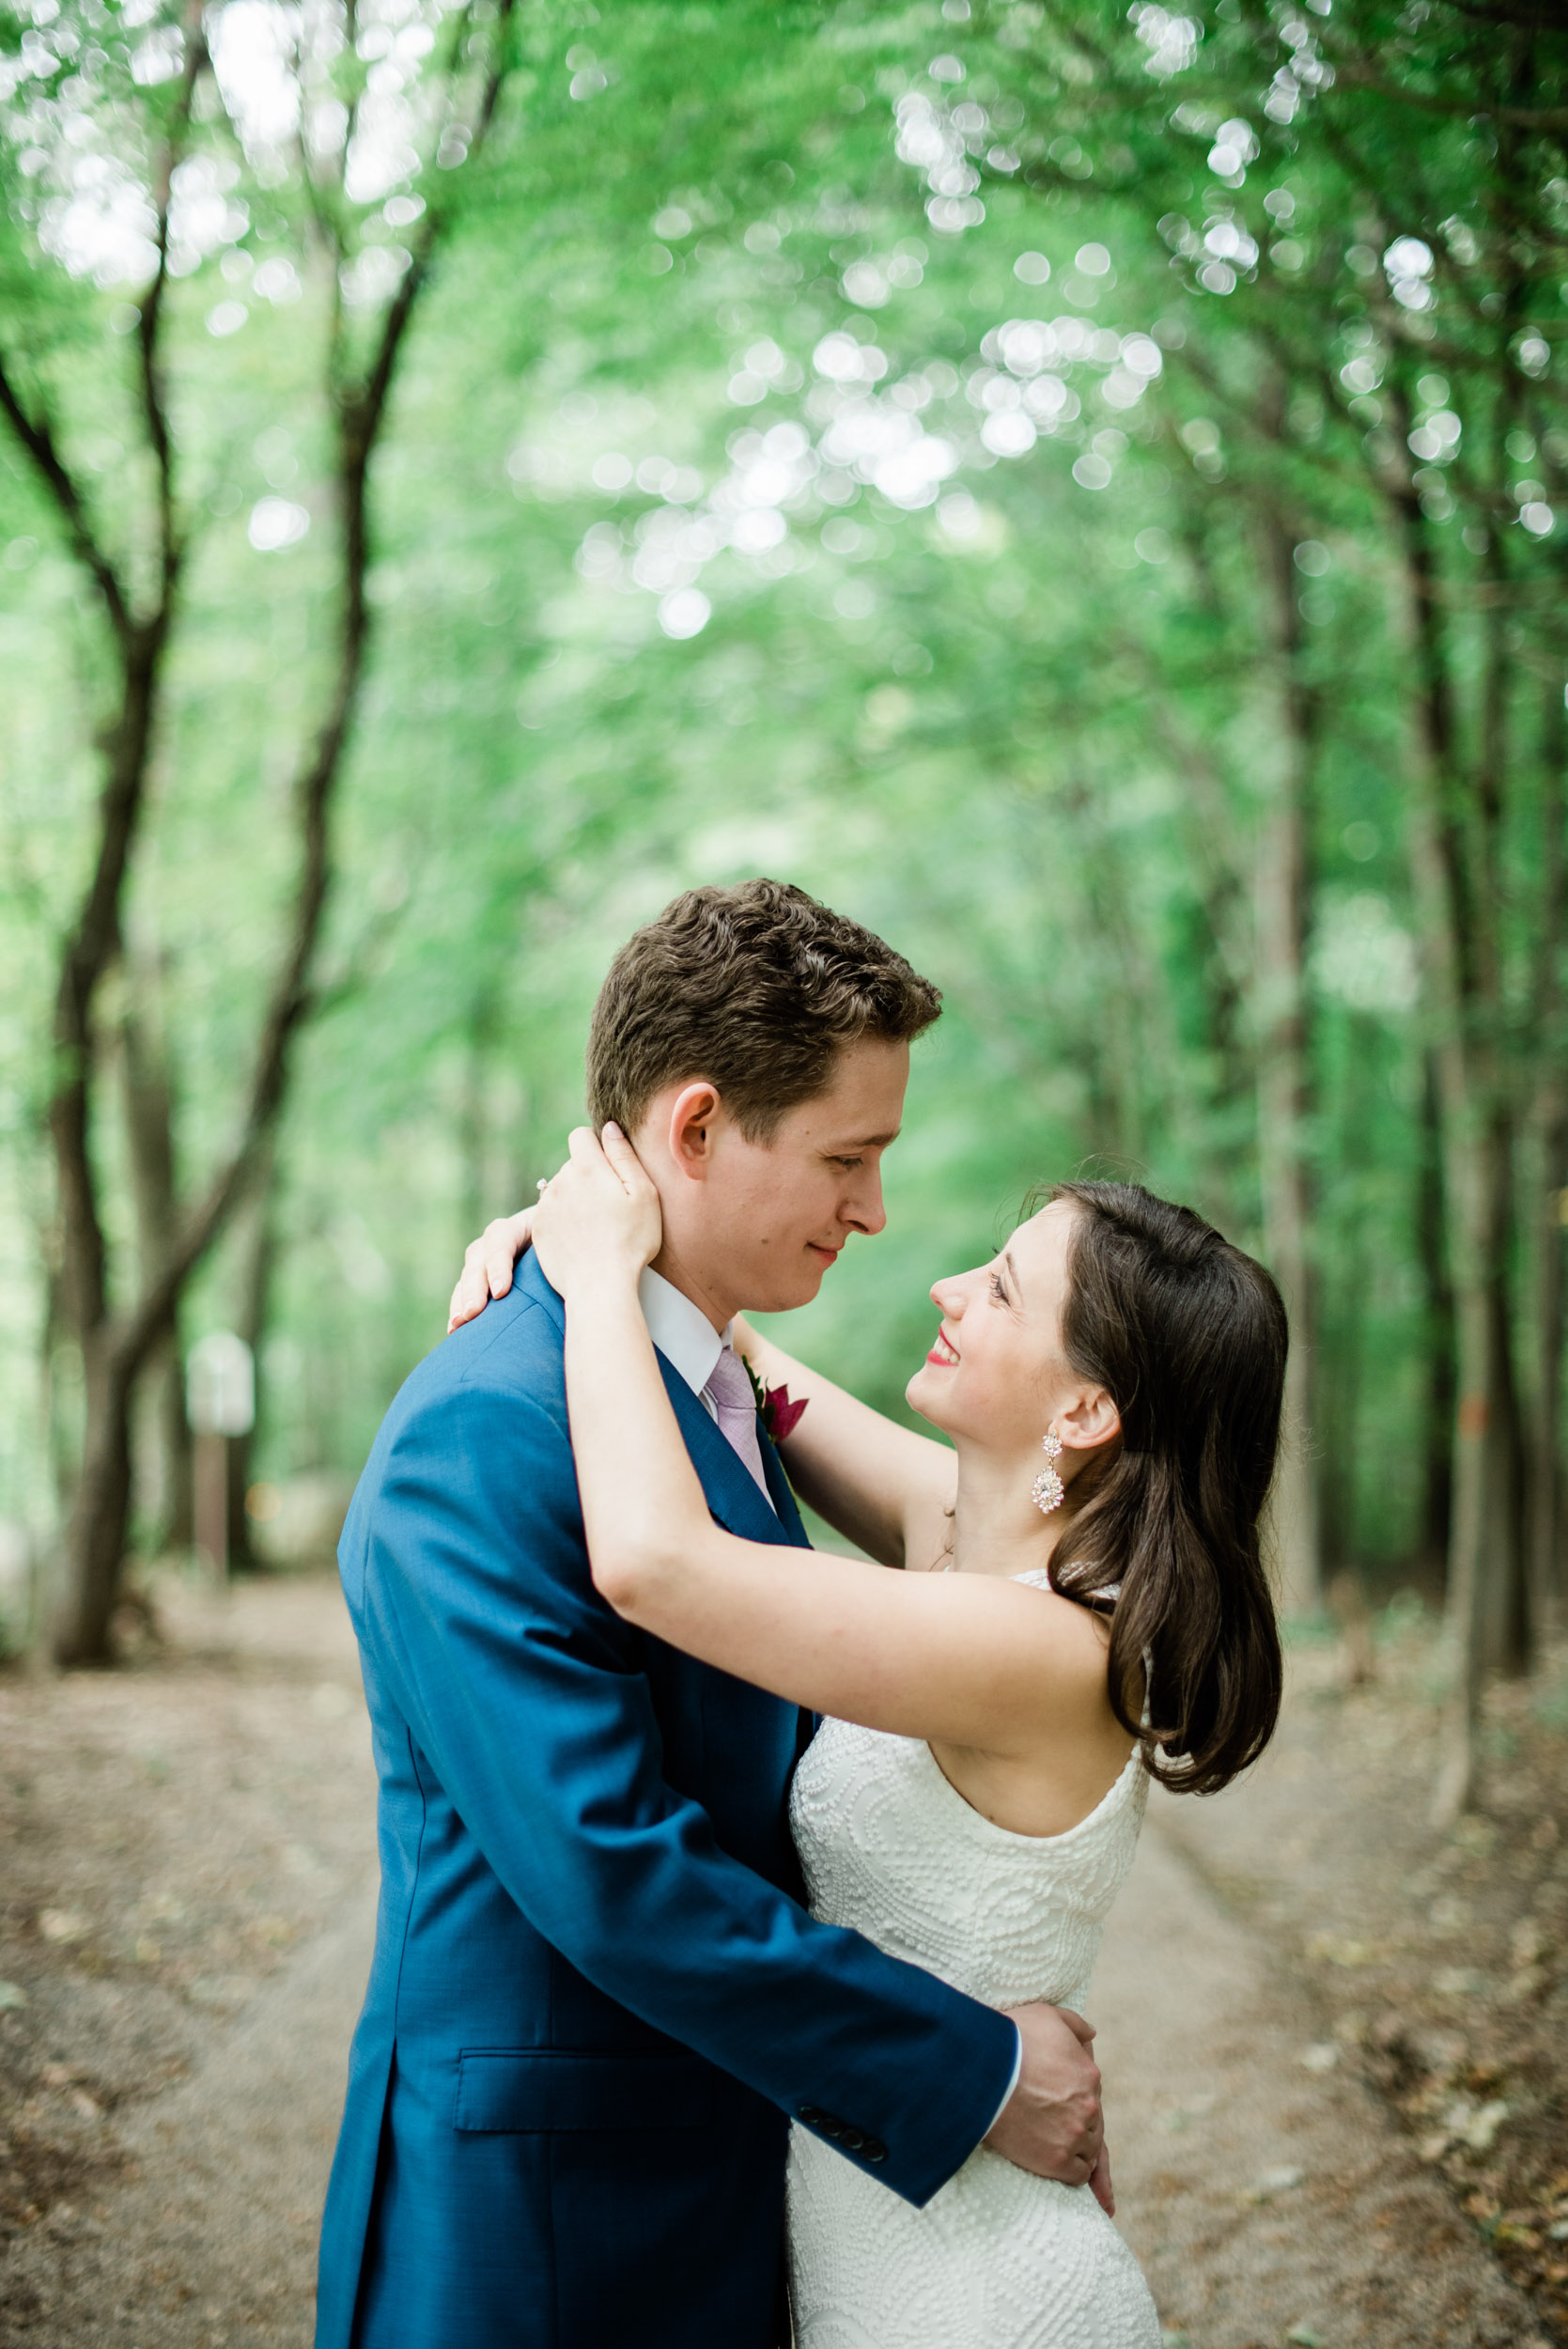 Fine Art Wedding Photographers near the Berkshires MA